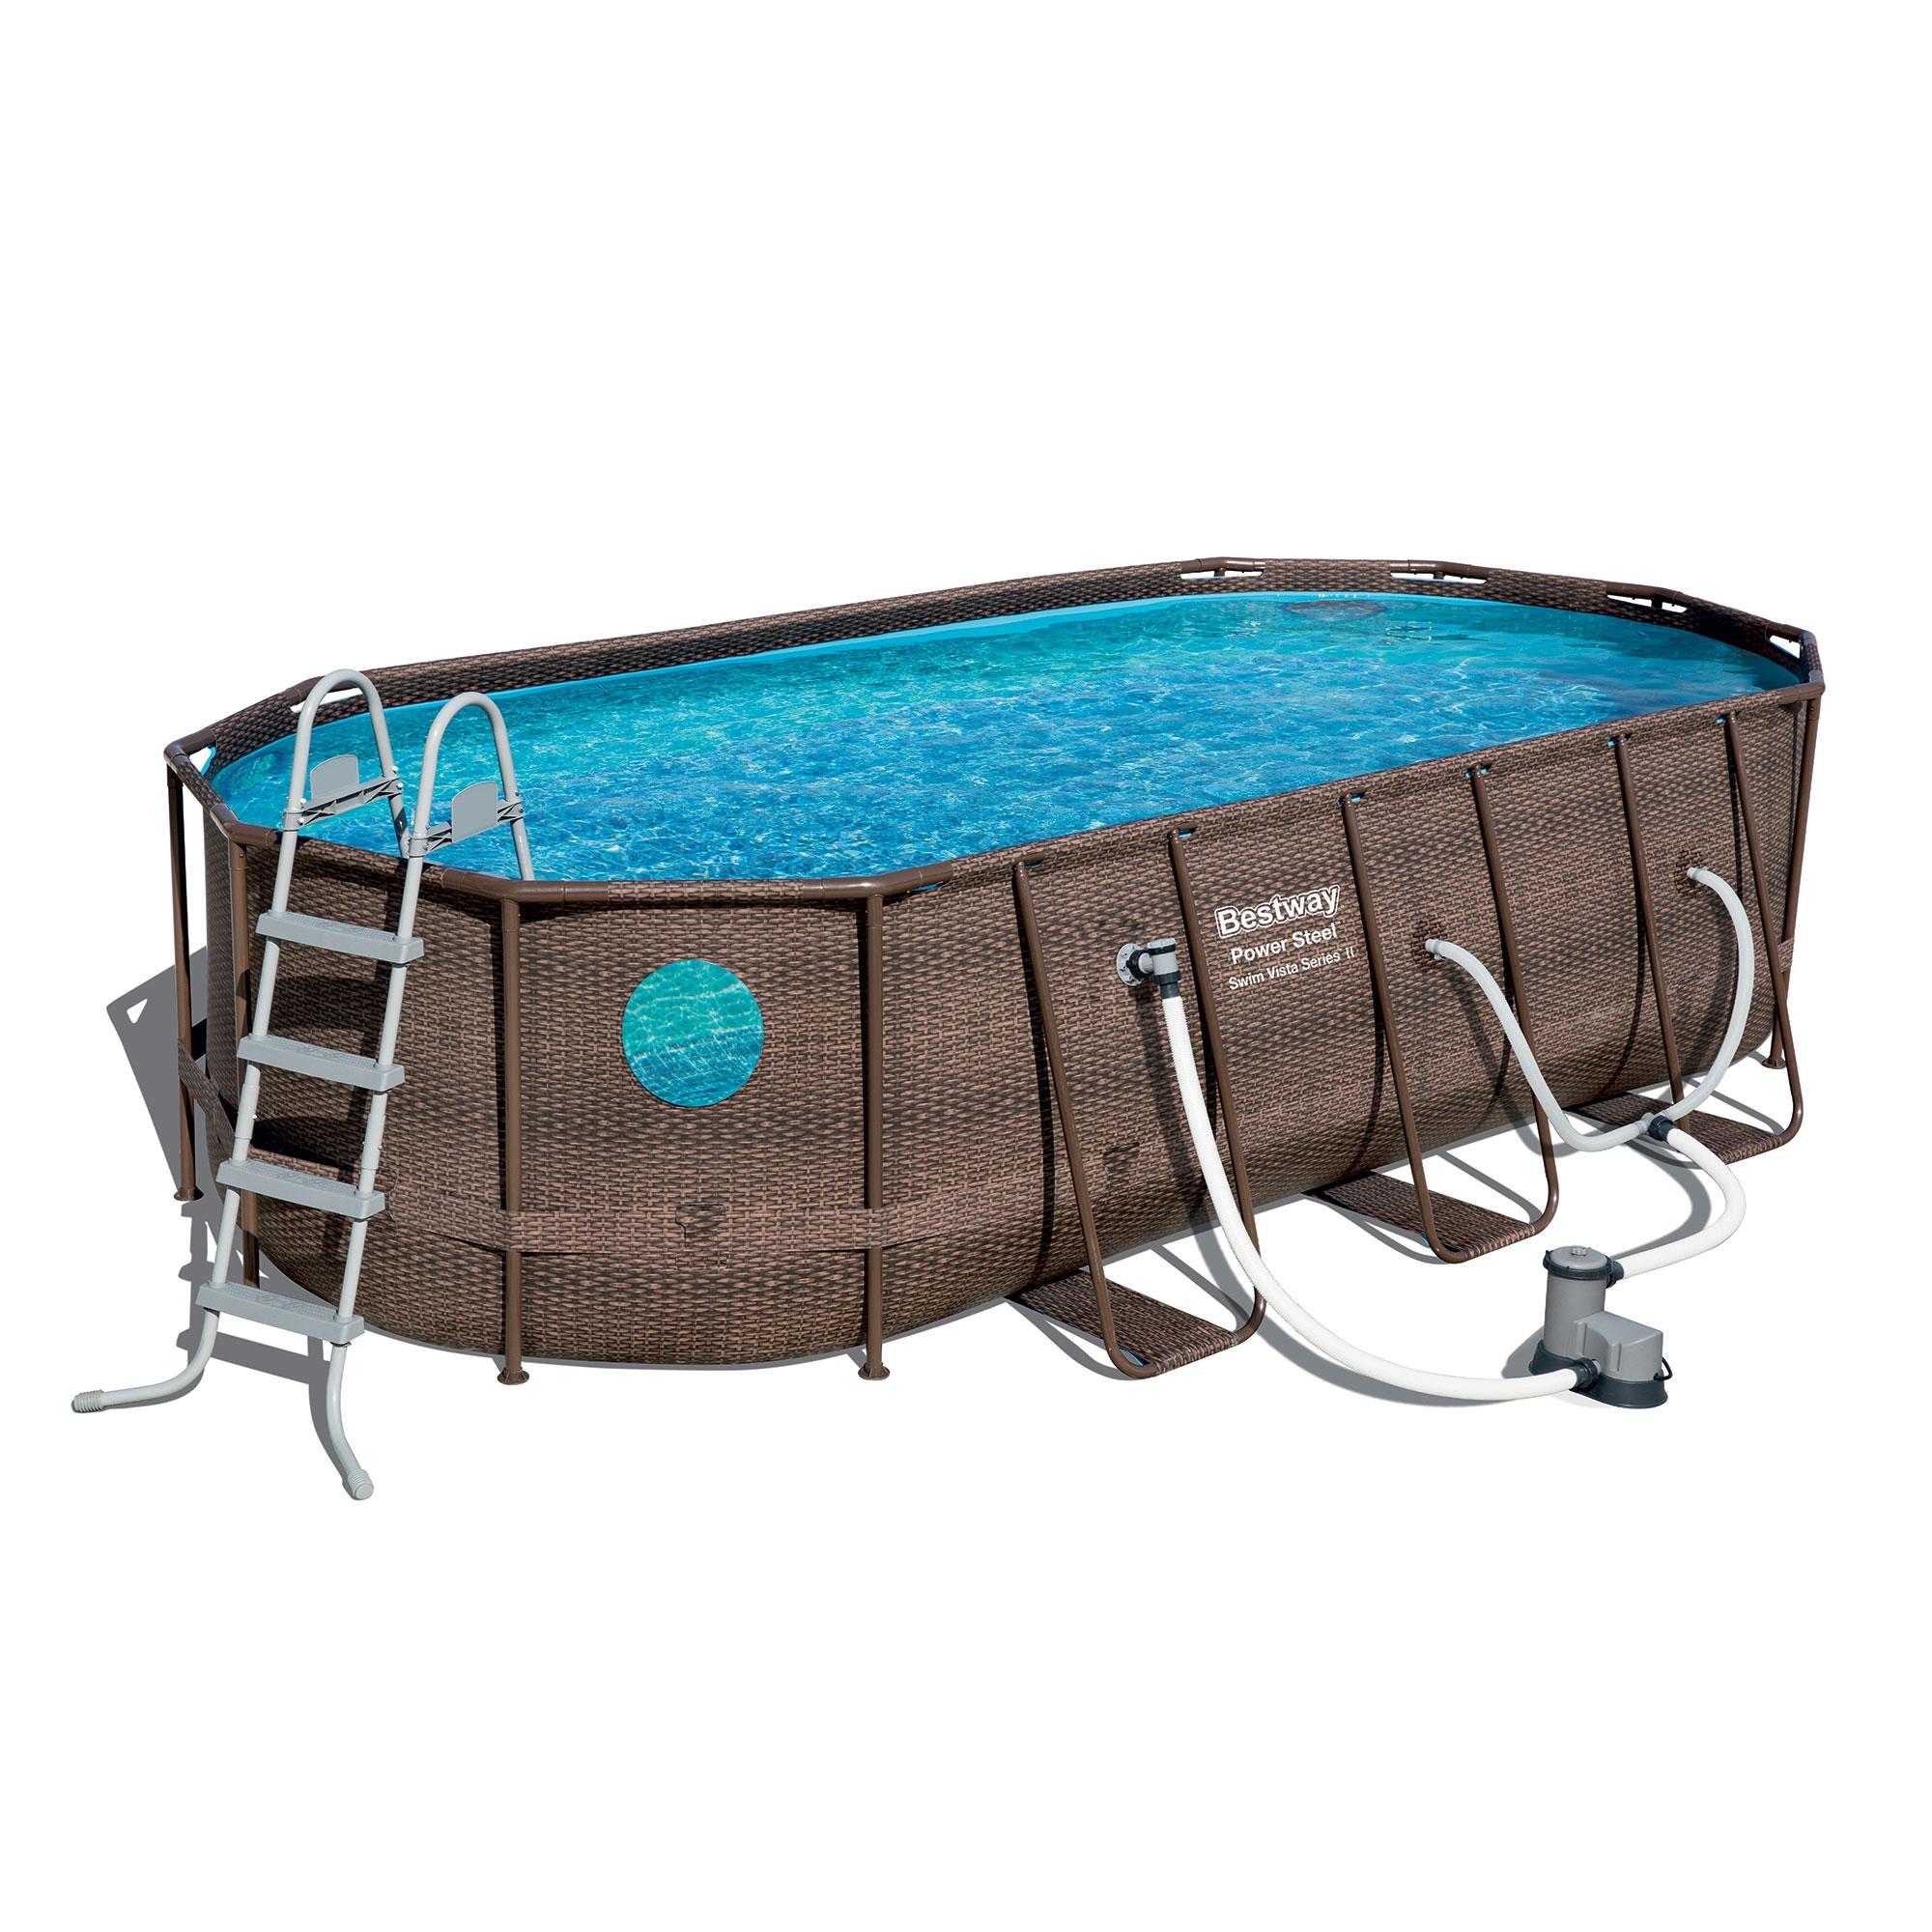 Details about Bestway Power Steel Swim Vista 18 x 9 x 4 Foot Swimming Pool  Set with Pump